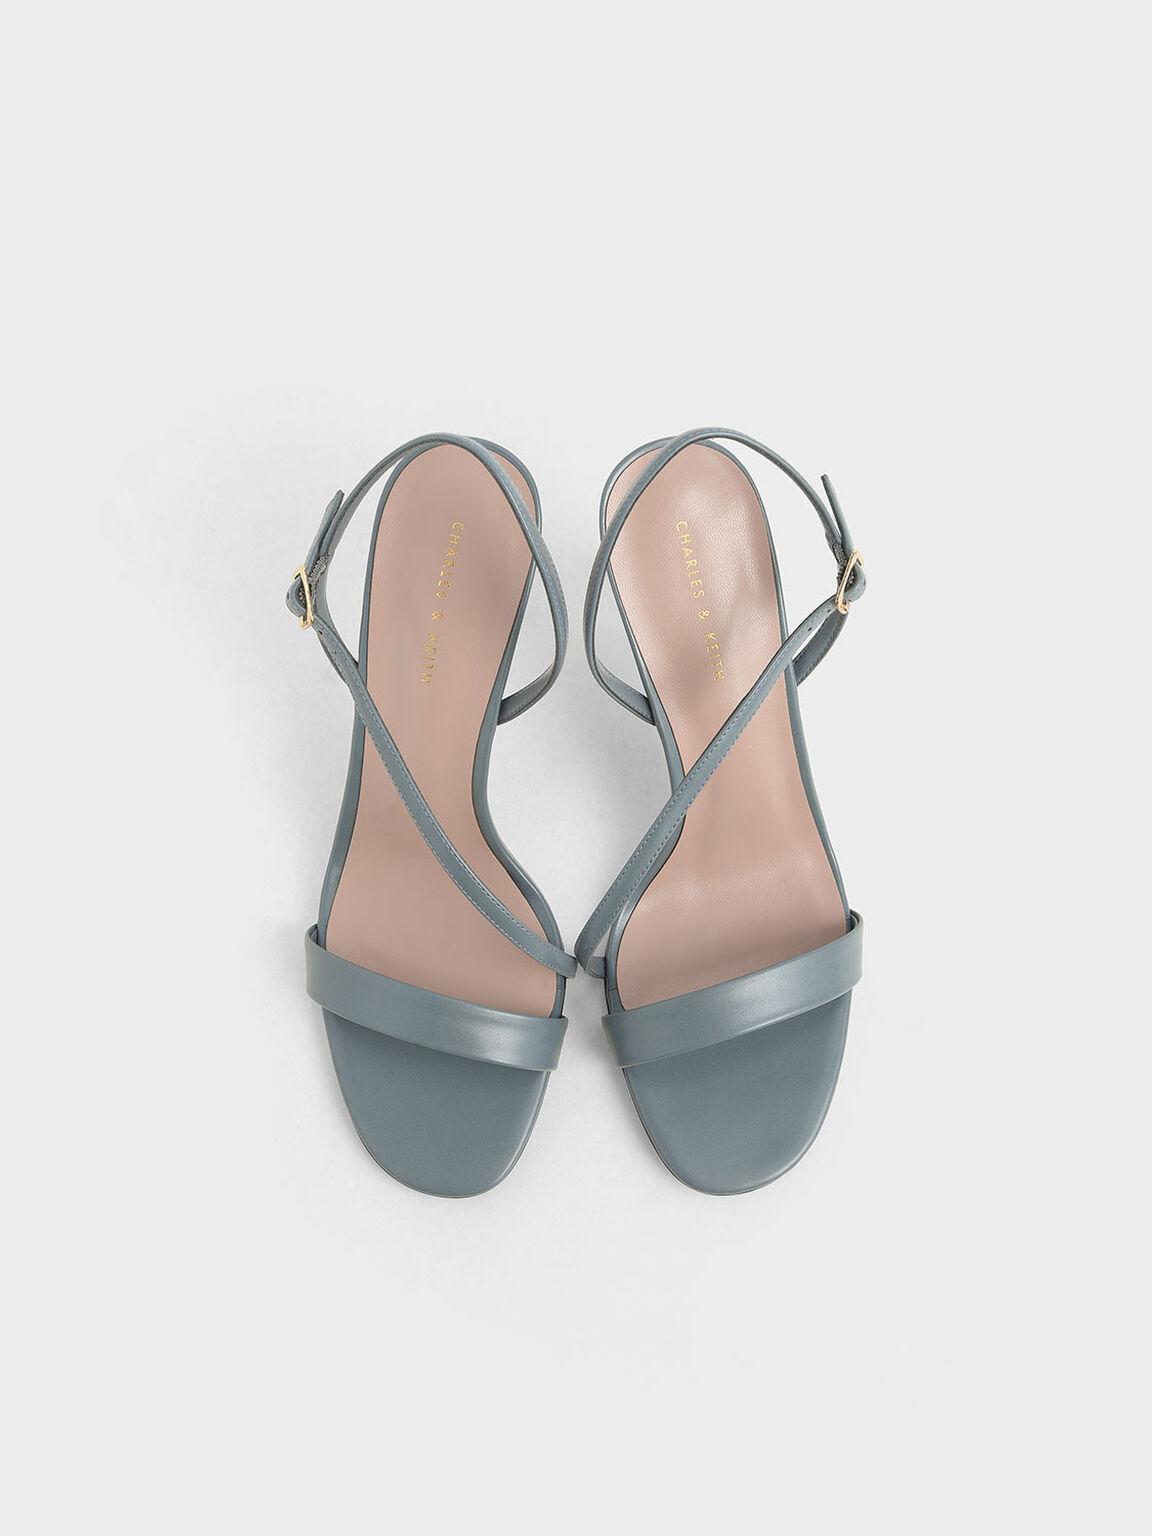 幾何帶高跟涼鞋, 藍色, hi-res